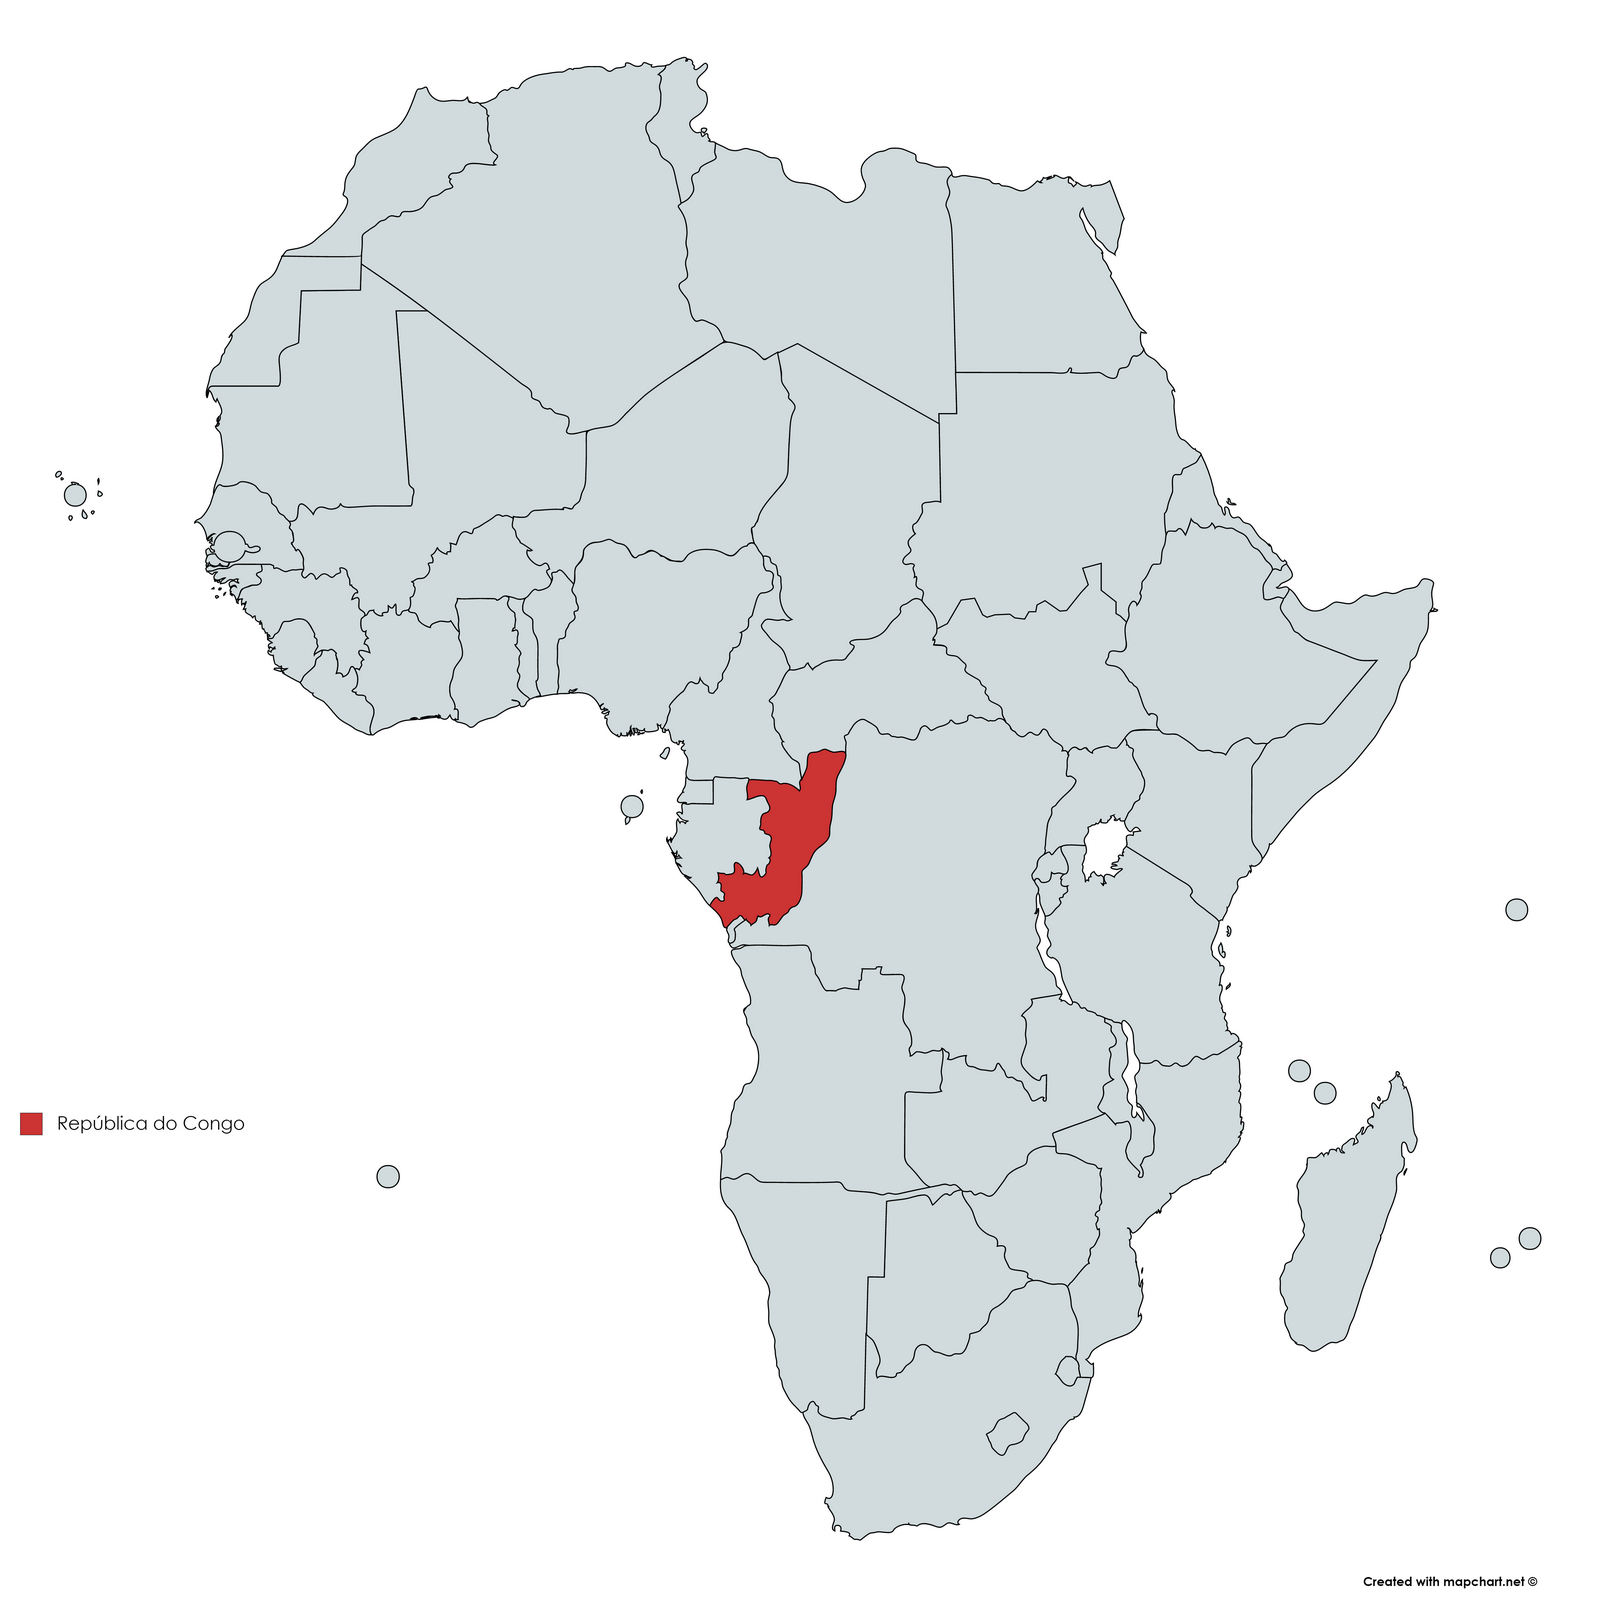 MAPA REPUBLICA DO CONGO